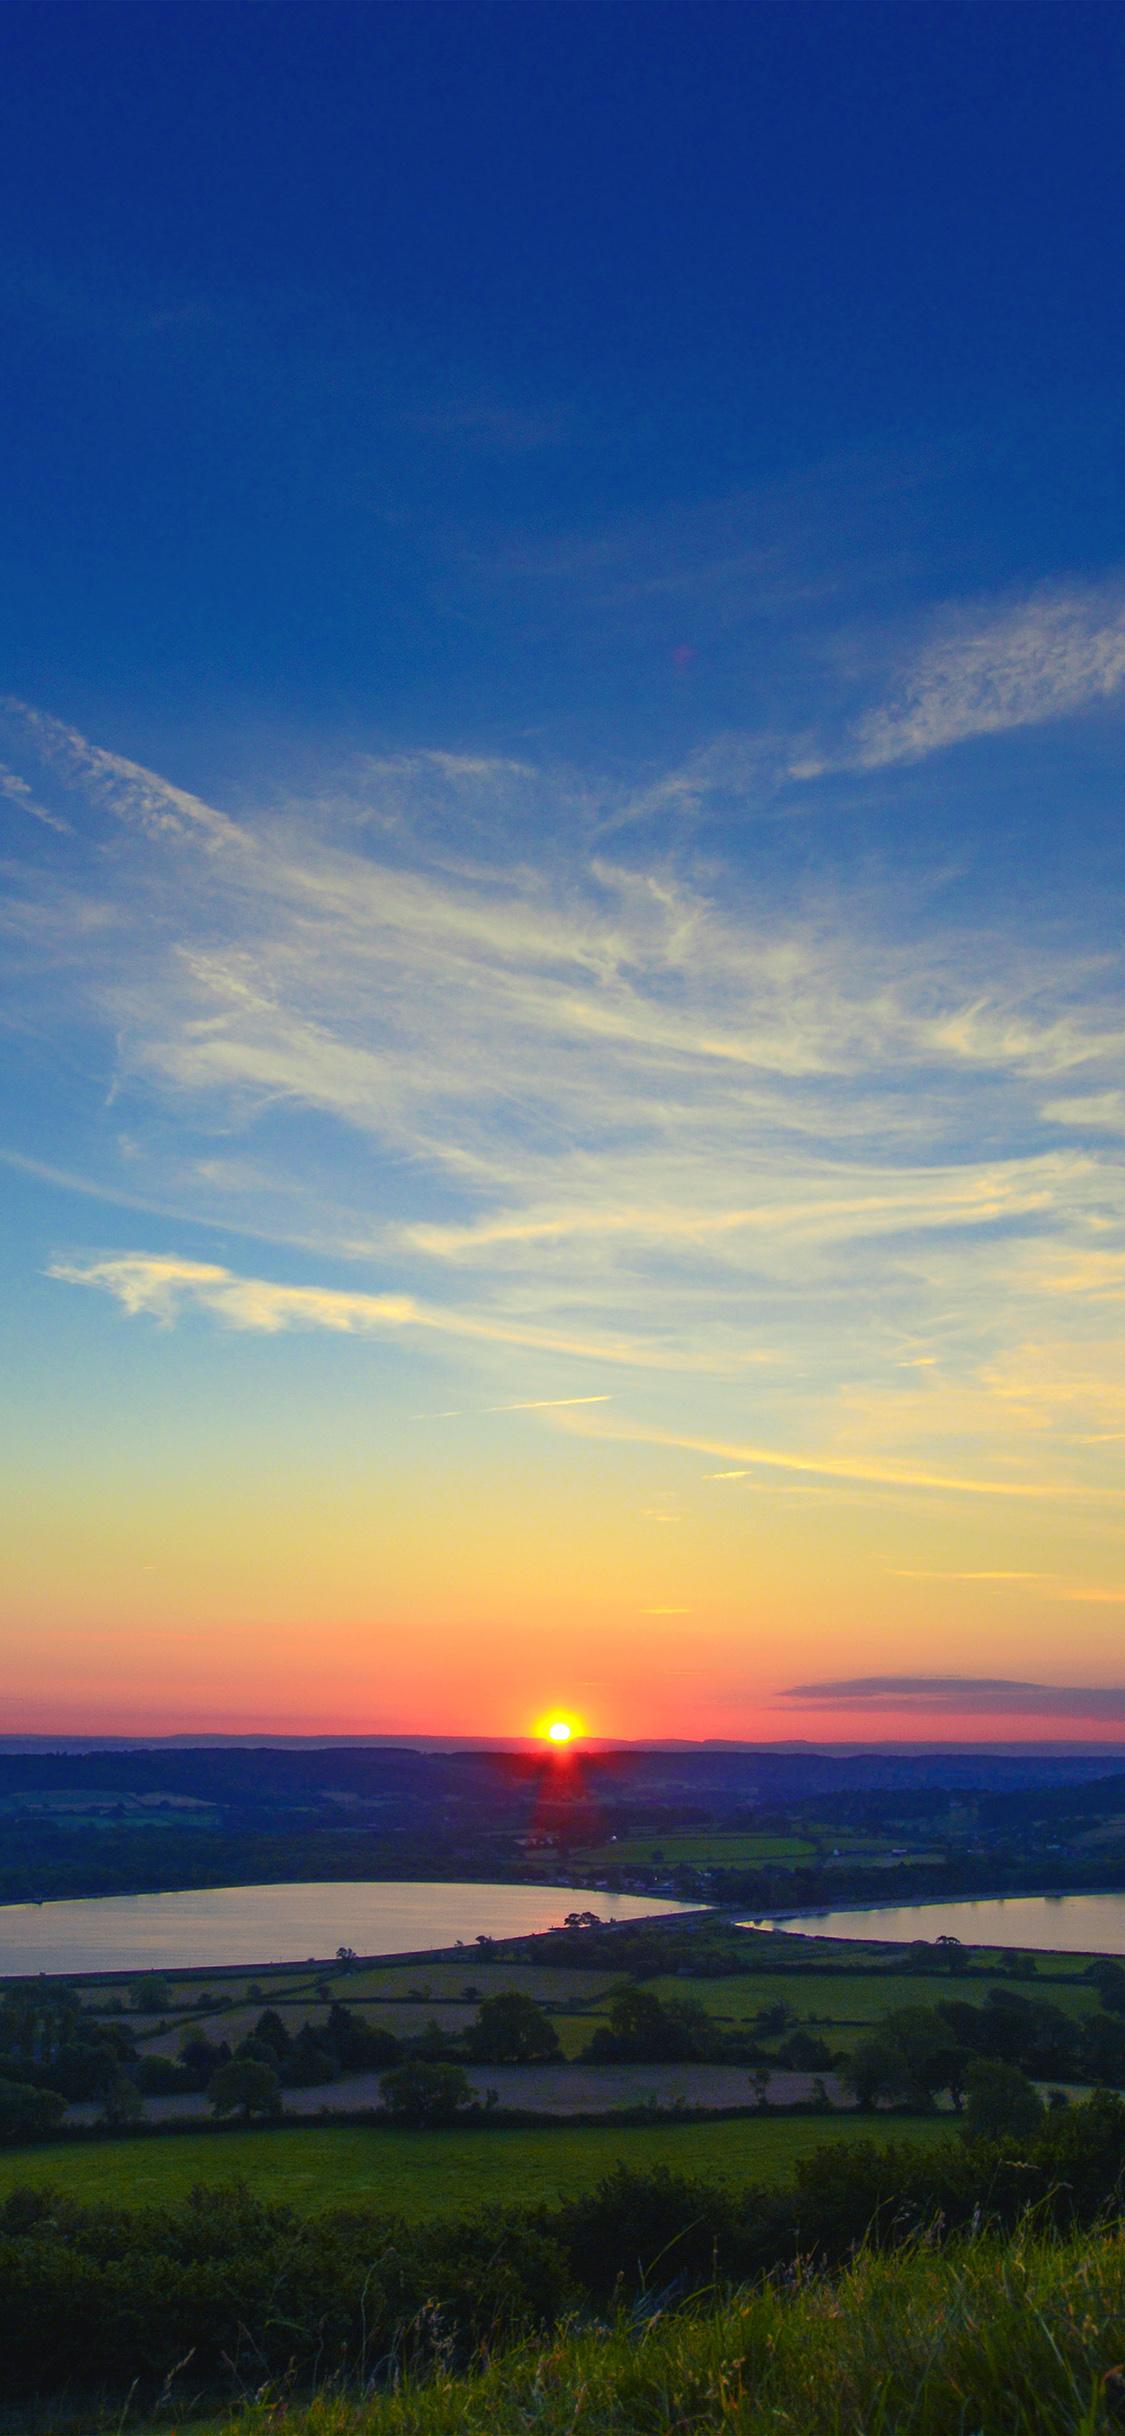 iPhonexpapers.com-Apple-iPhone-wallpaper-ni15-sunset-peace-land-sky-blue-nature-summer